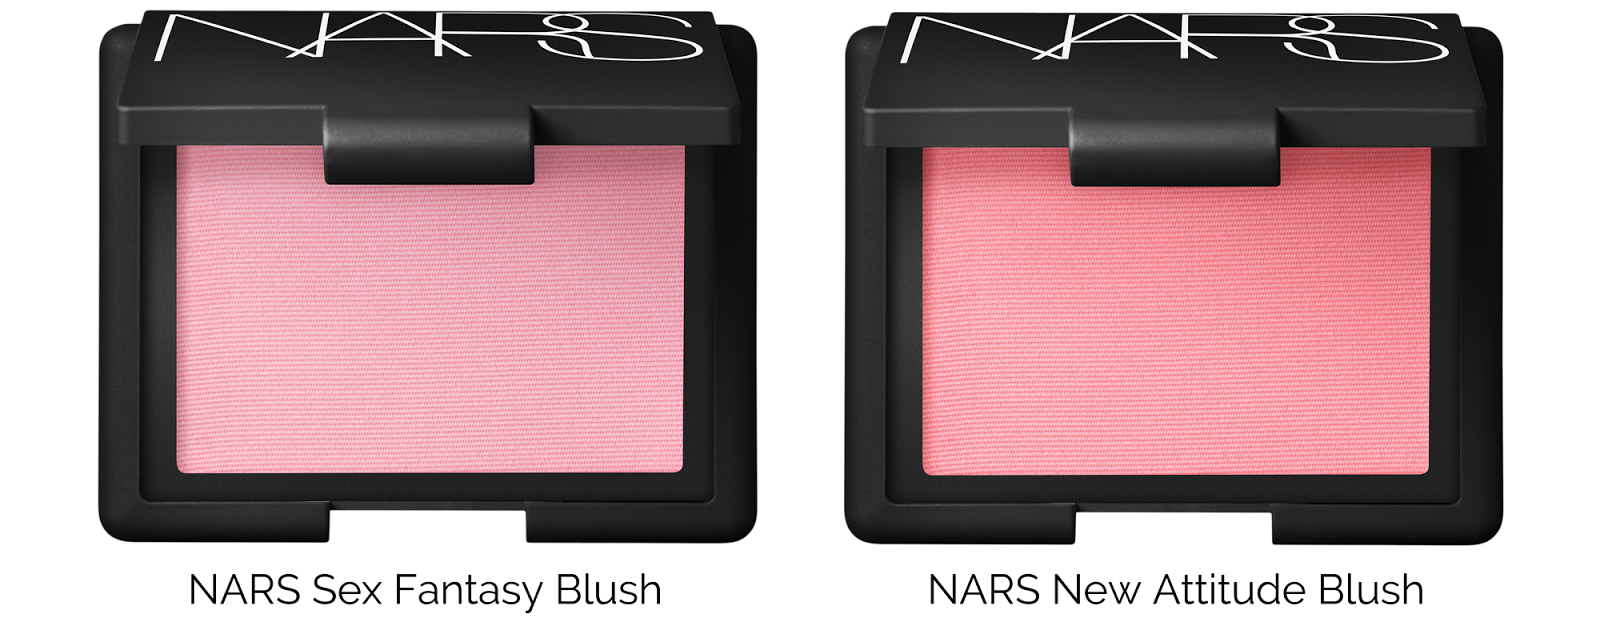 NARS Final Cut, Edge of Pink Spring 2014 Makeup Collection